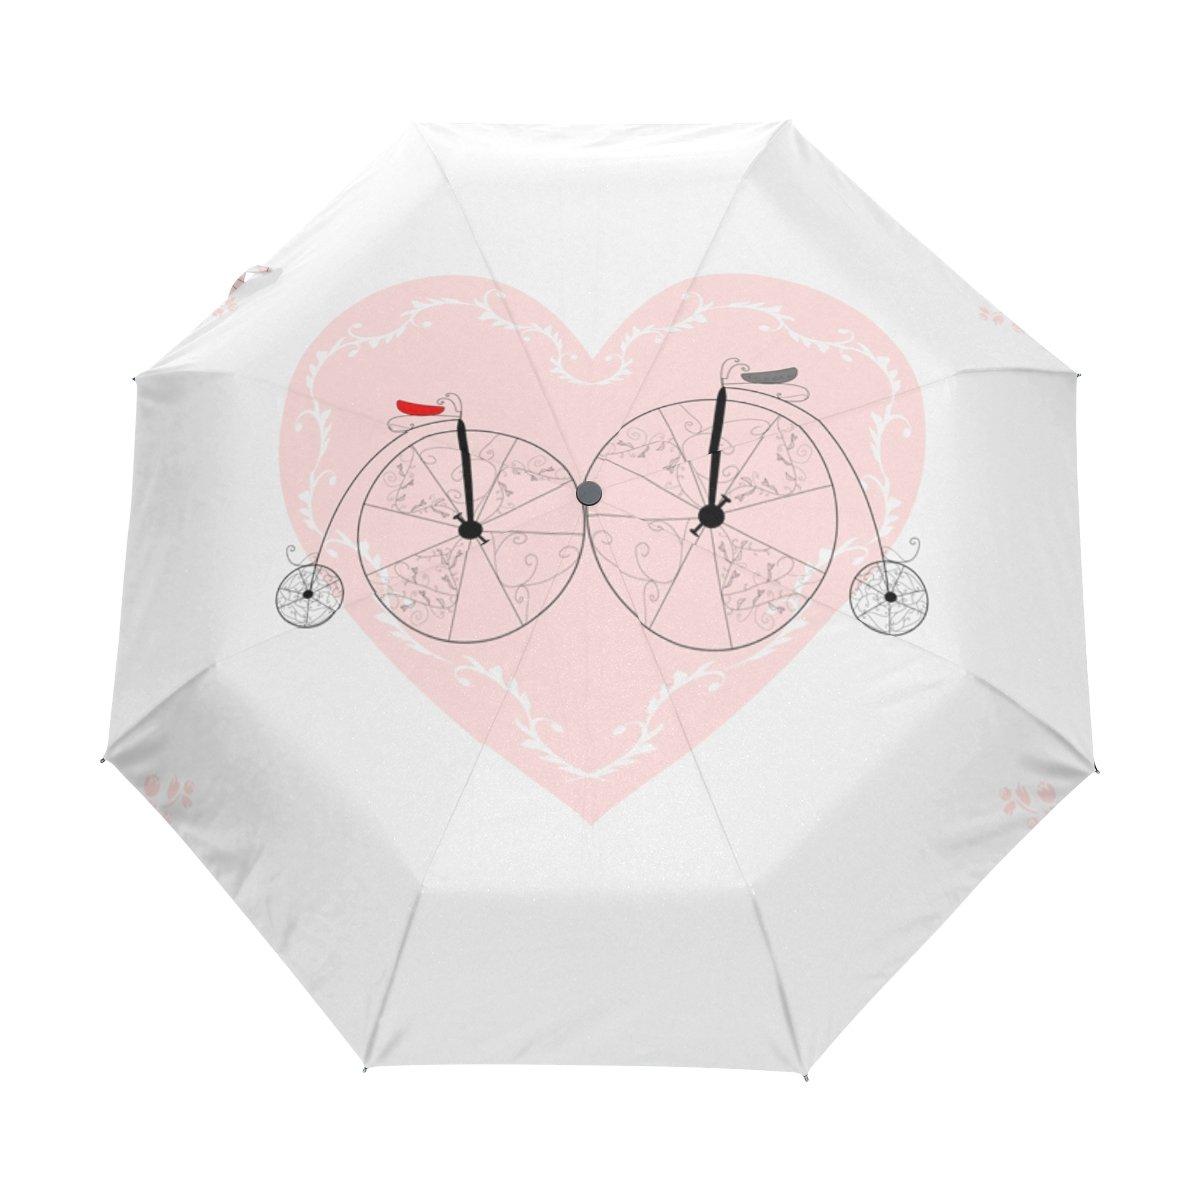 JSTeL Valentine 's Day Love Heart防風UV傘Auto Open Close 3折りたたみゴルフStrong Durableコンパクト旅行太陽傘、ポータブル軽量簡単キャリー   B06XYR61VV